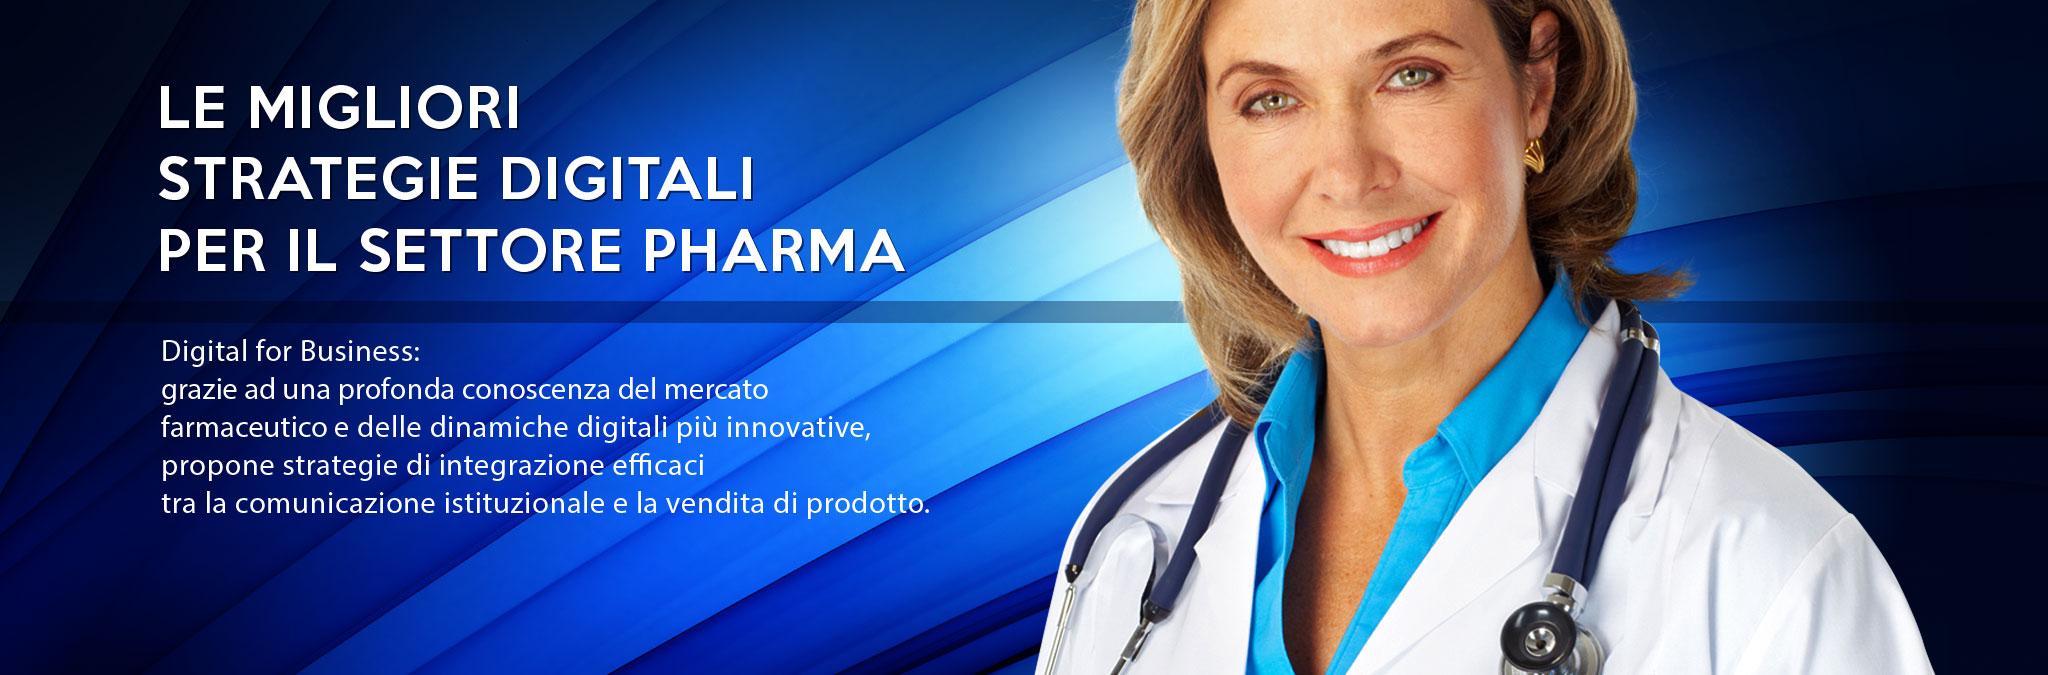 Digital for Business Farmaceutico